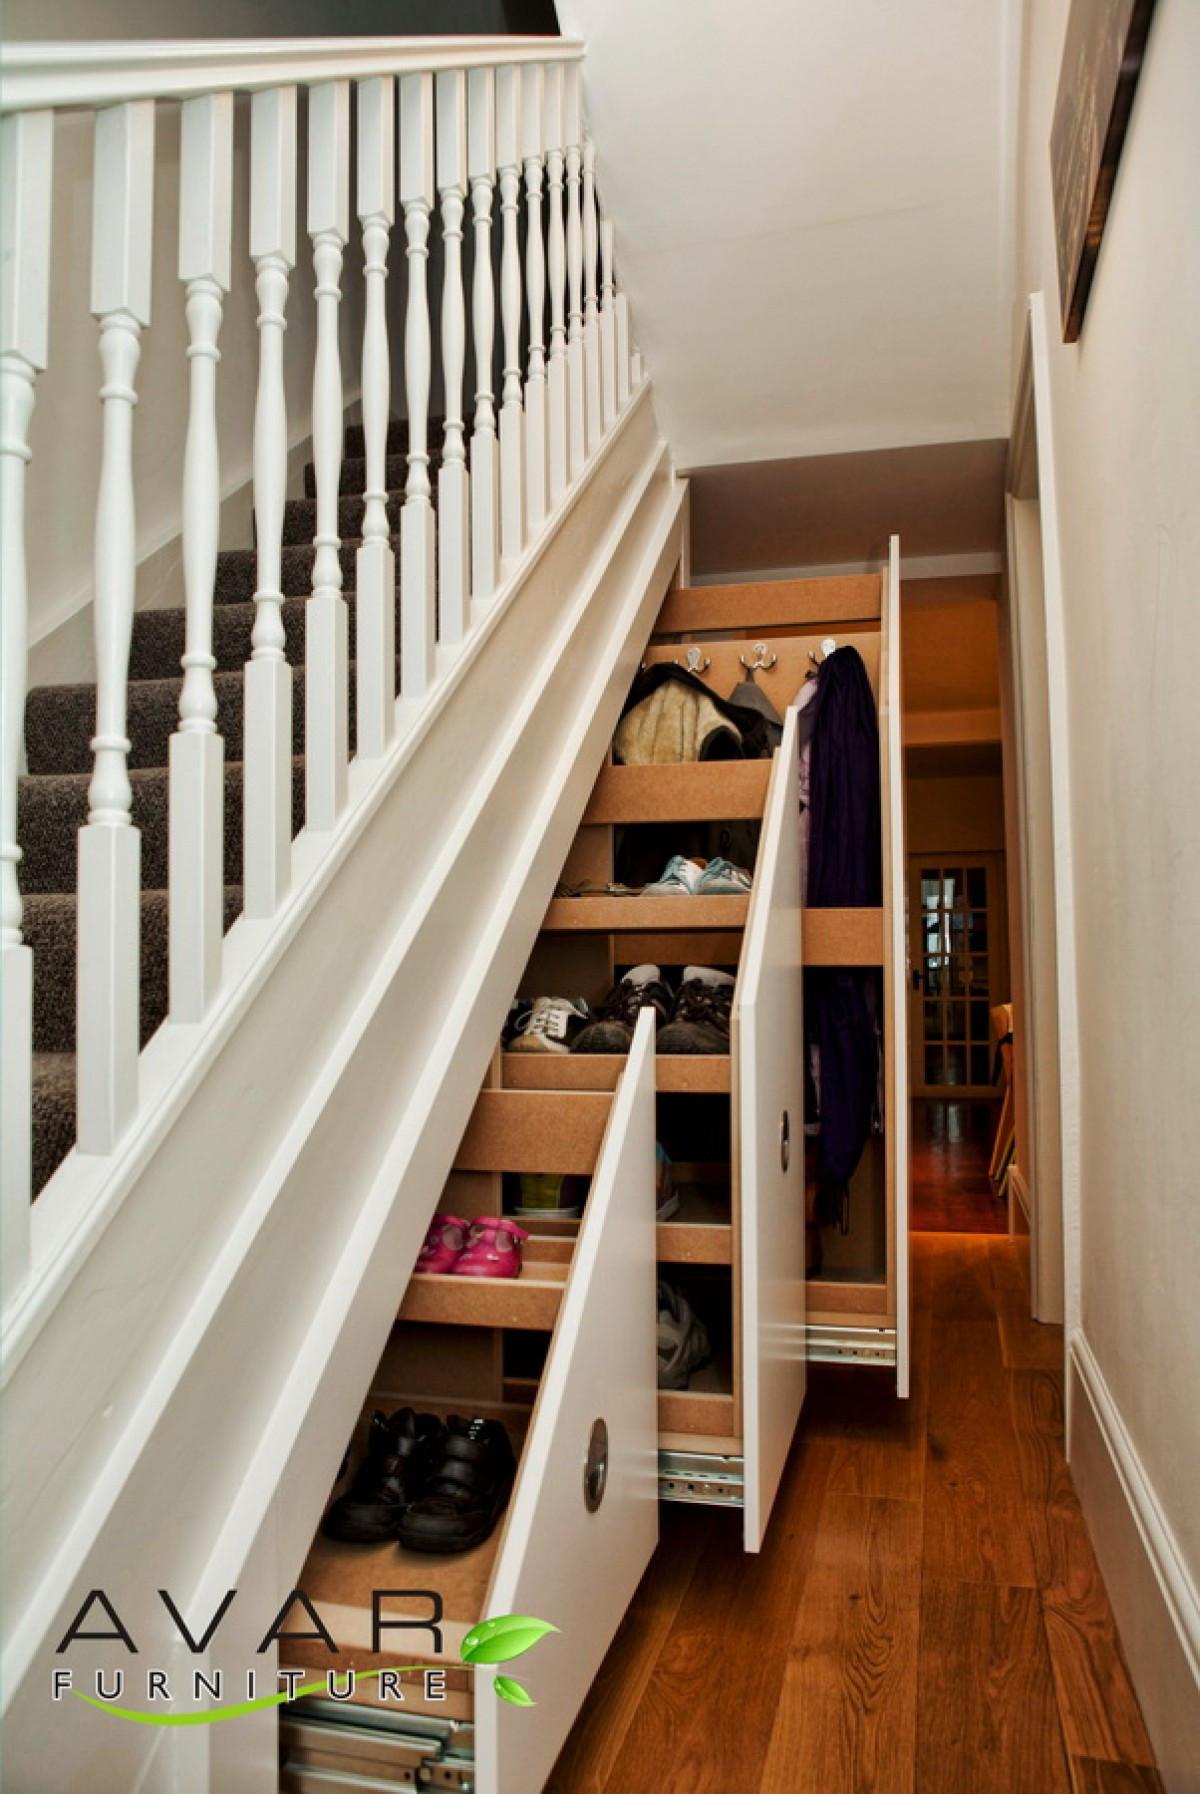 Best ideas about Under Stair Storage Ideas . Save or Pin Under The Stairs Storage Ideas Now.